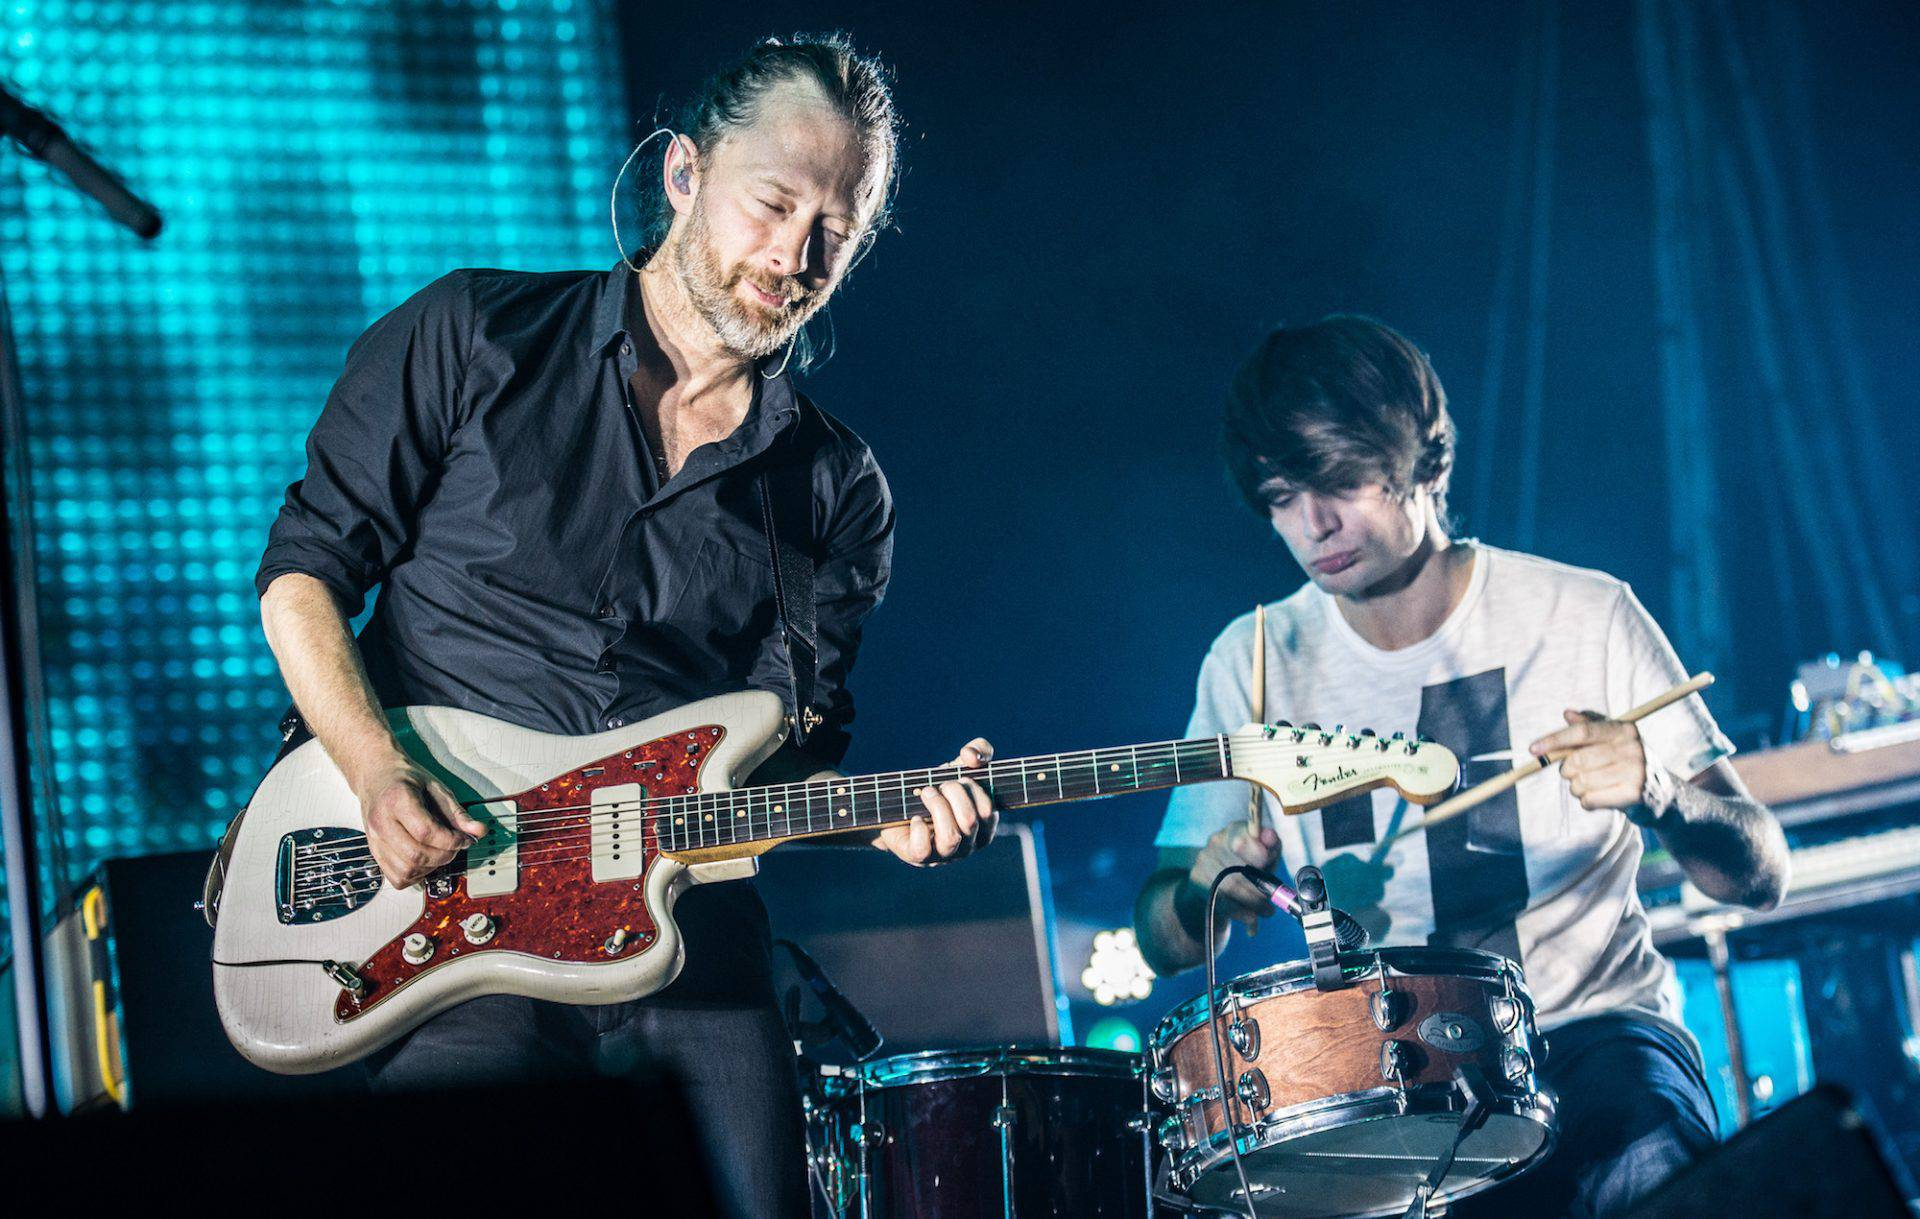 Gitarist Radioheada: 'Film o nama bio bi čista katastrofa'